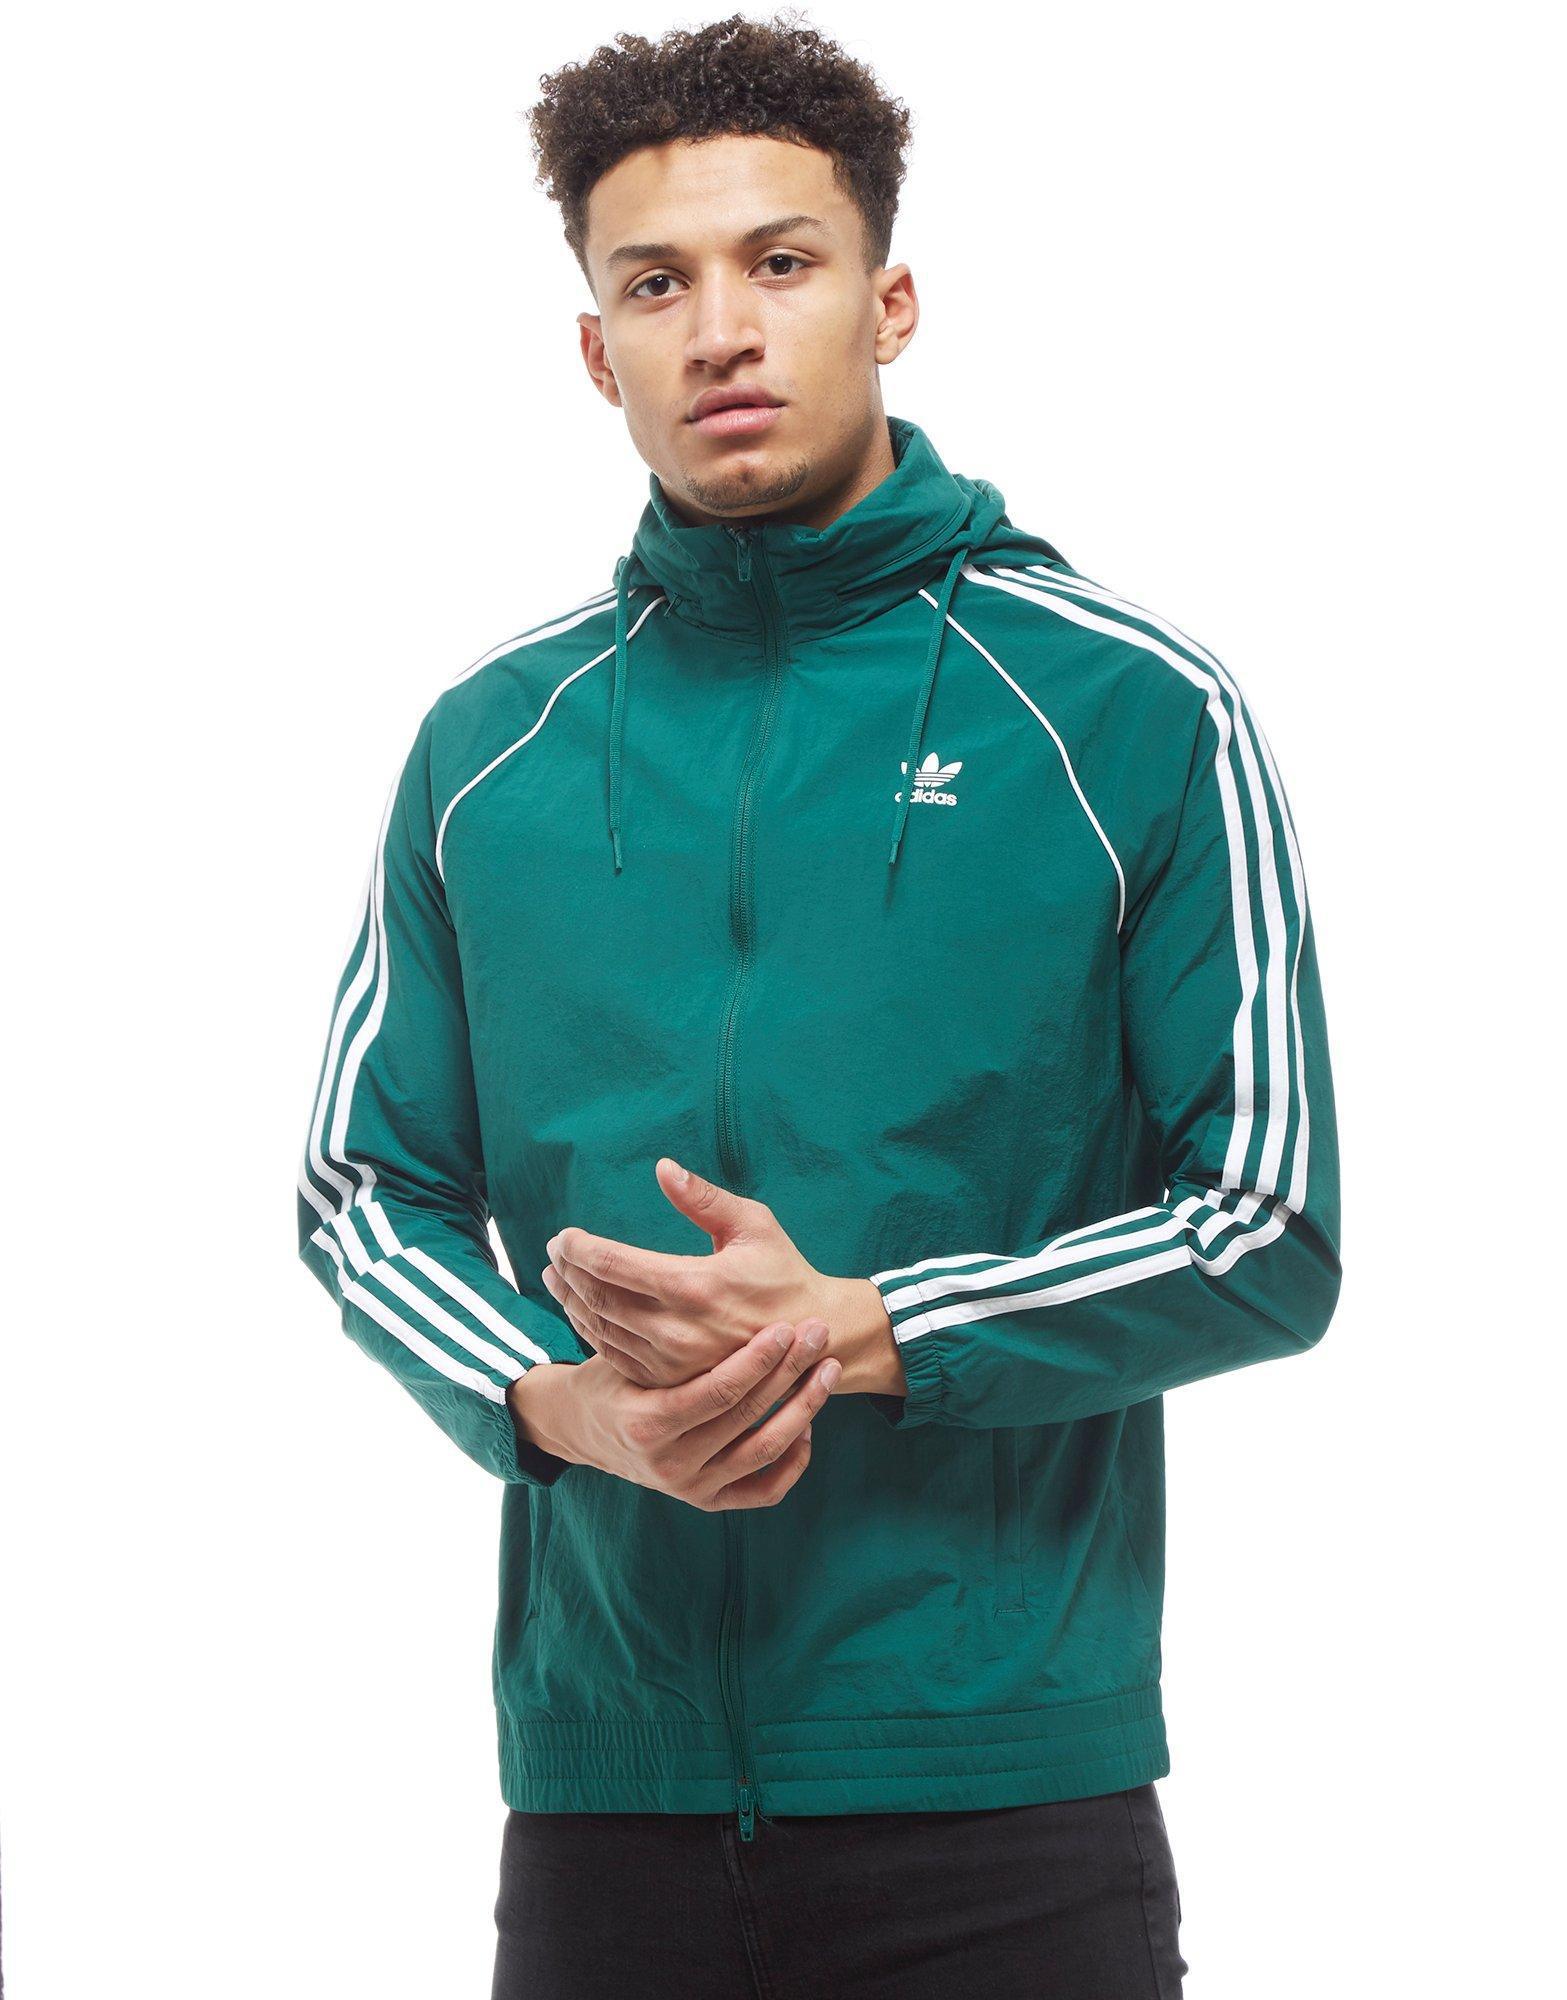 Adidas Originals Mens Superstar Windbreaker Green White In Green For